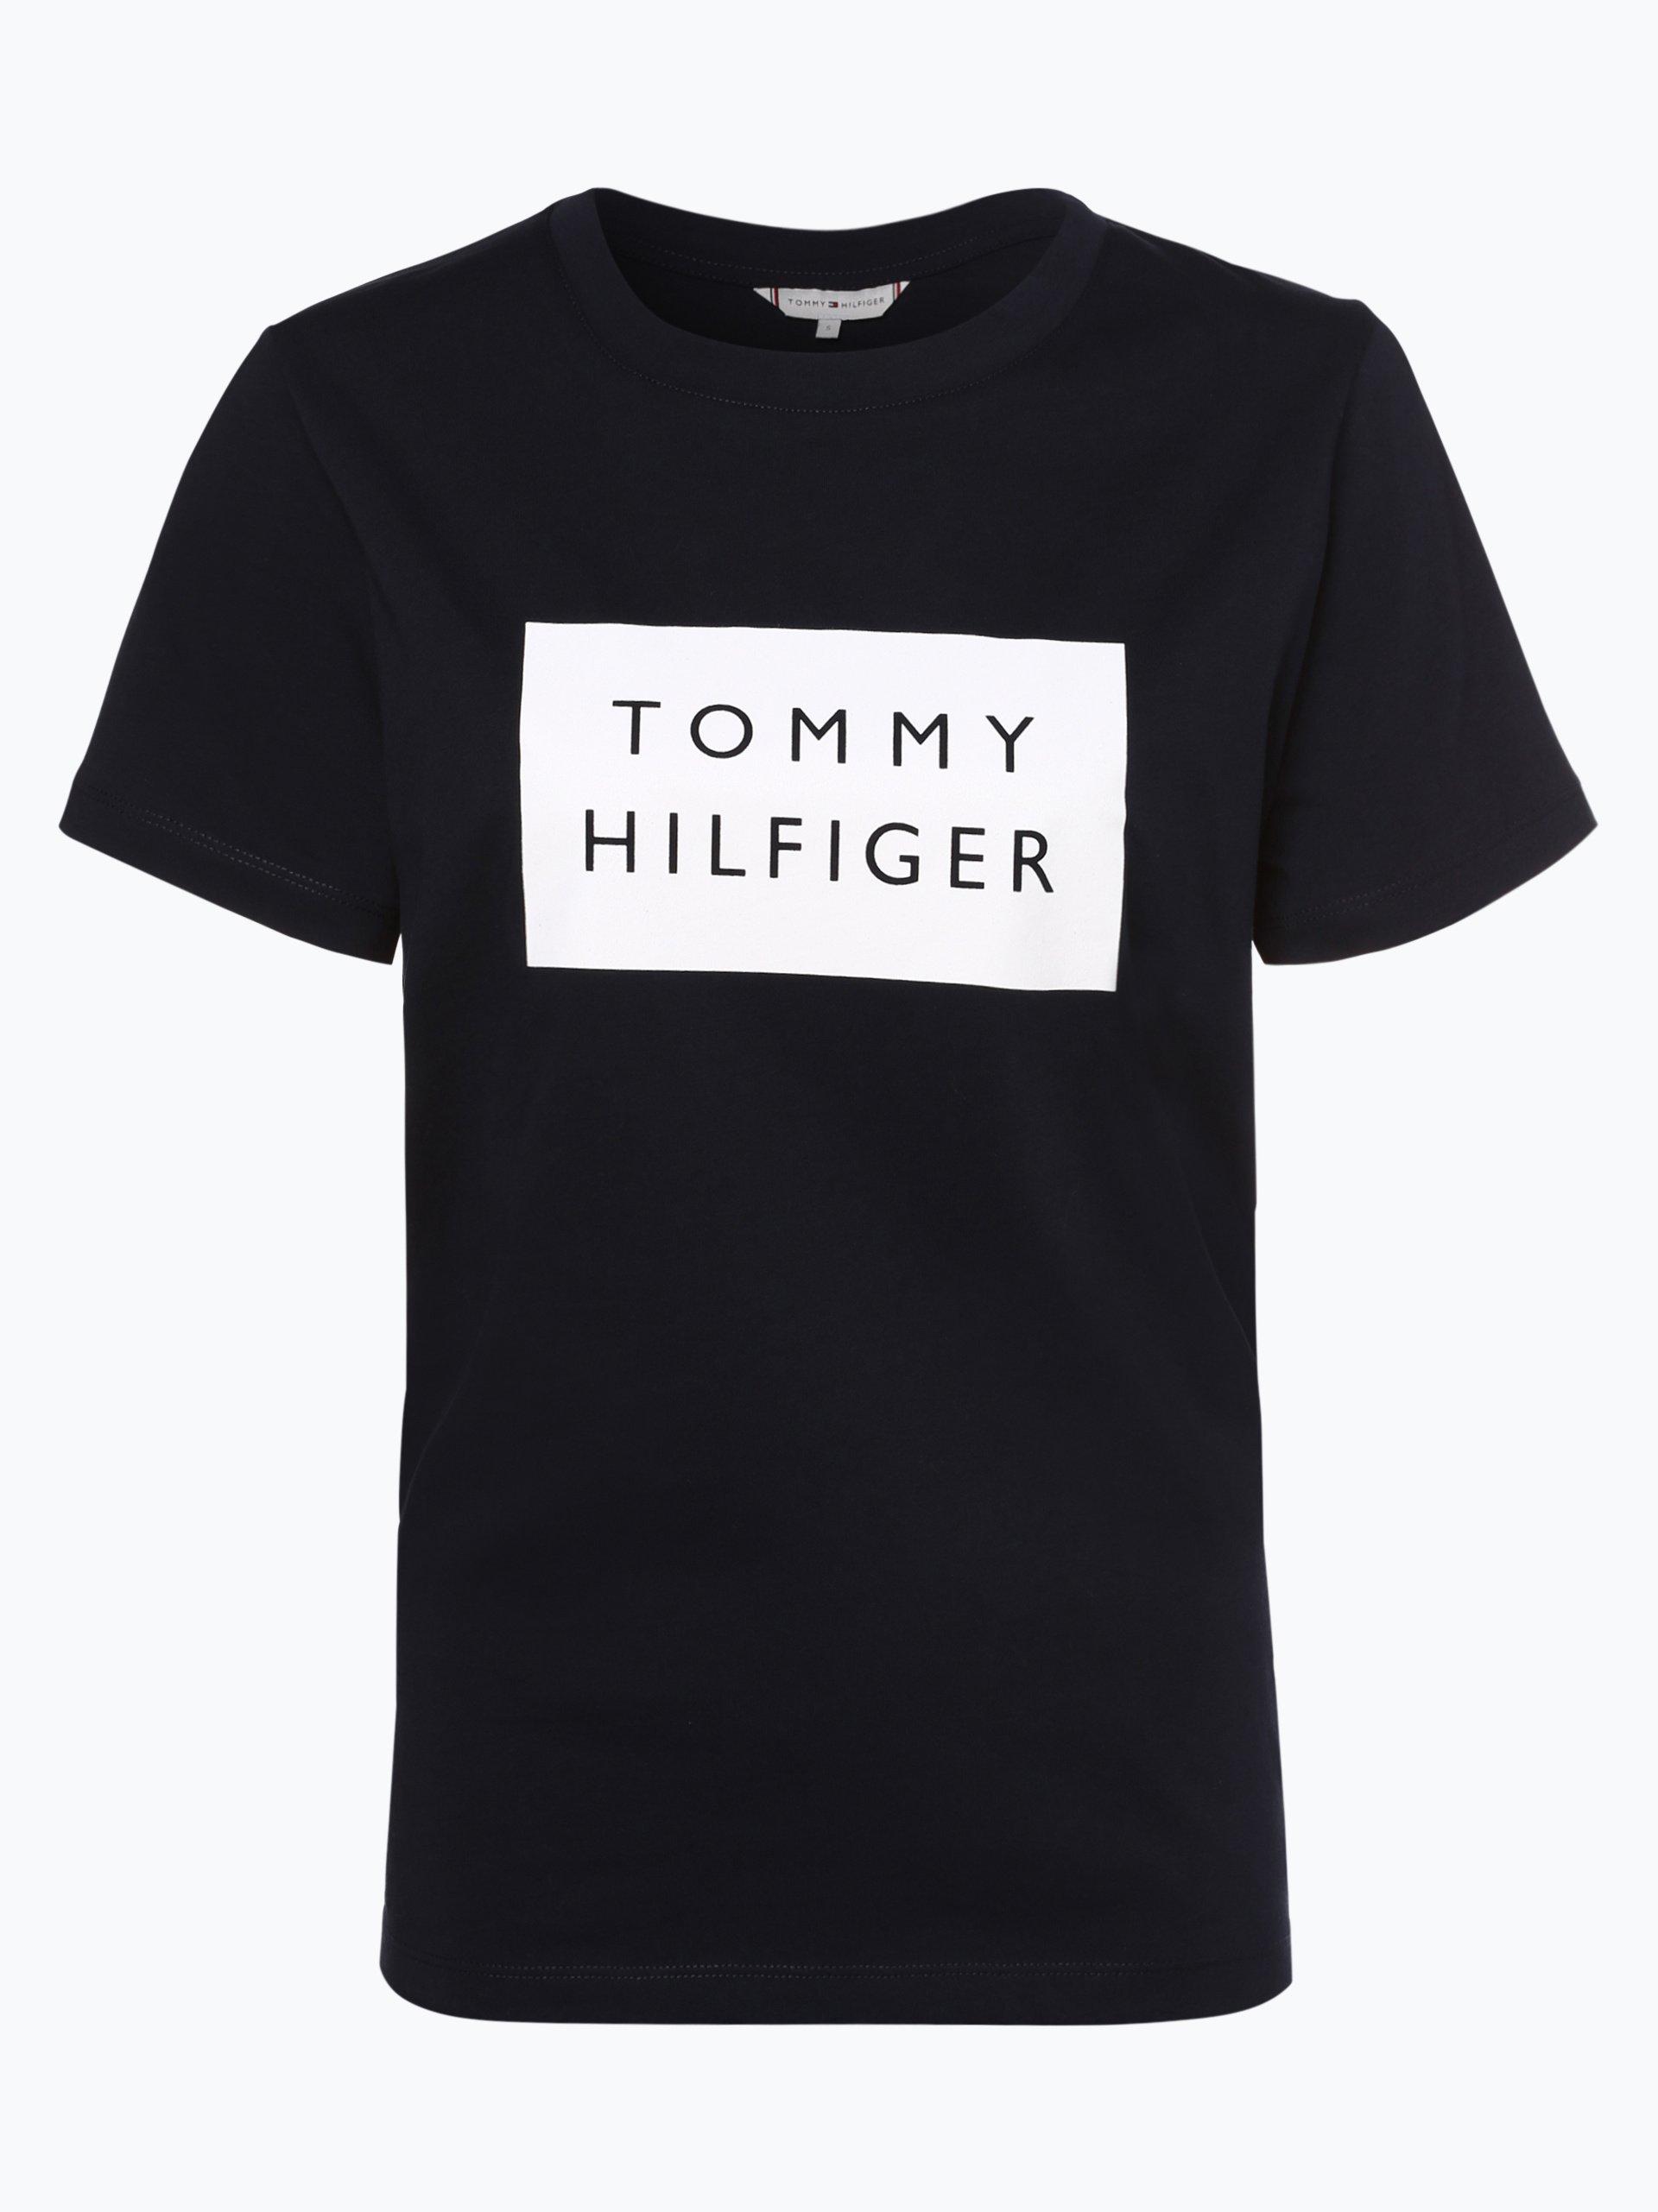 tommy hilfiger damen t shirt marine bedruckt online kaufen. Black Bedroom Furniture Sets. Home Design Ideas